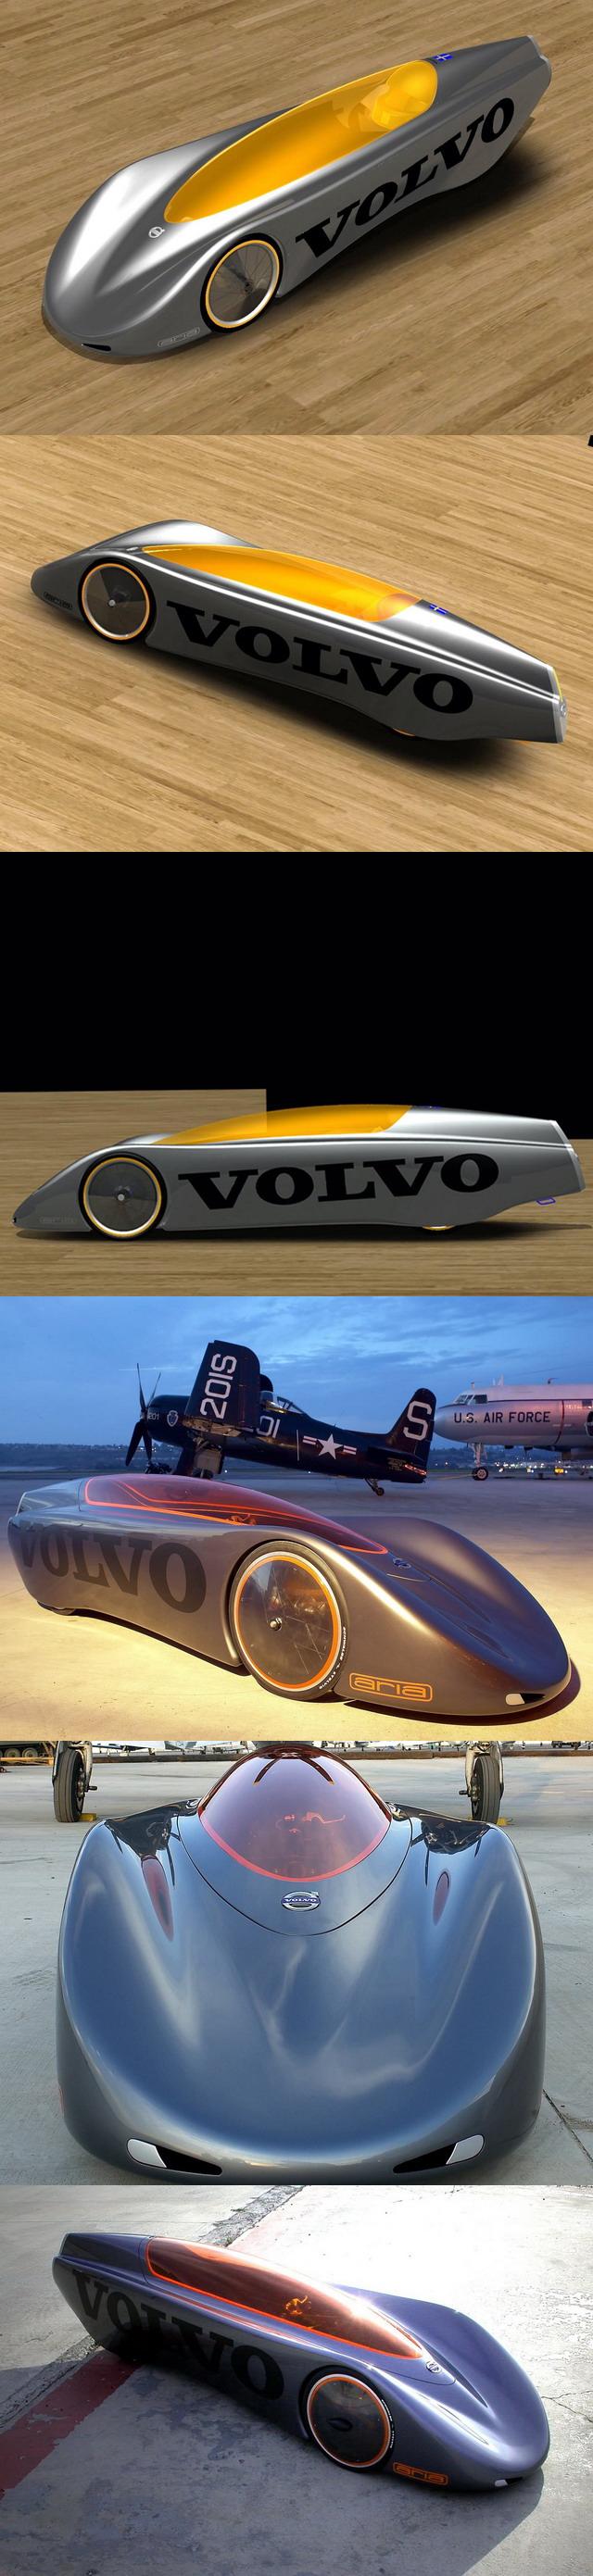 Ee Concept volvo gravity car concept 2005 from http conceptcar